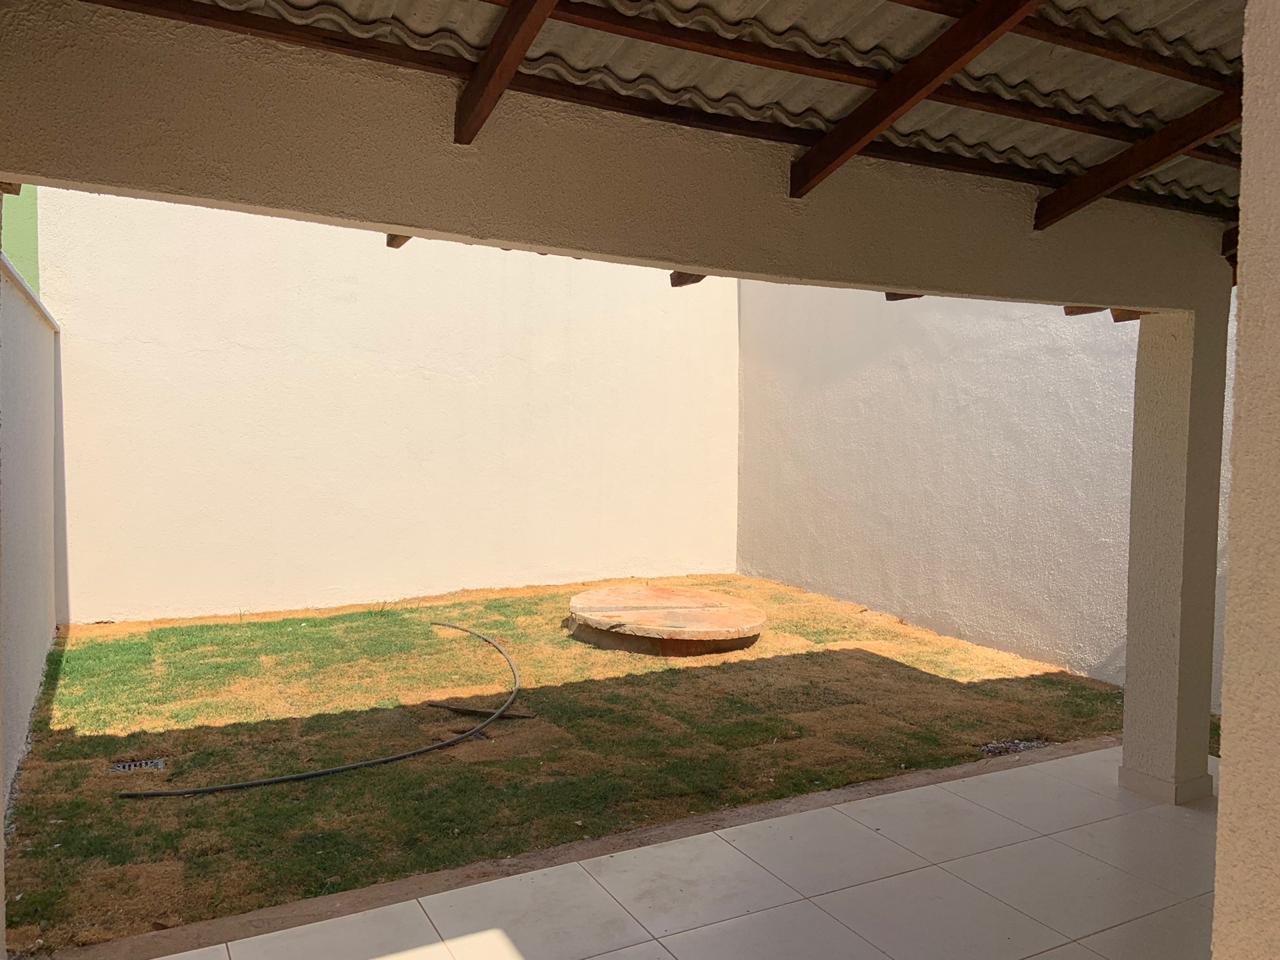 FOTO5 - Casa à venda Rua Farme de Amoedo,Jardim Buriti Sereno, Aparecida de Goiânia - R$ 170.000 - CA0261 - 6